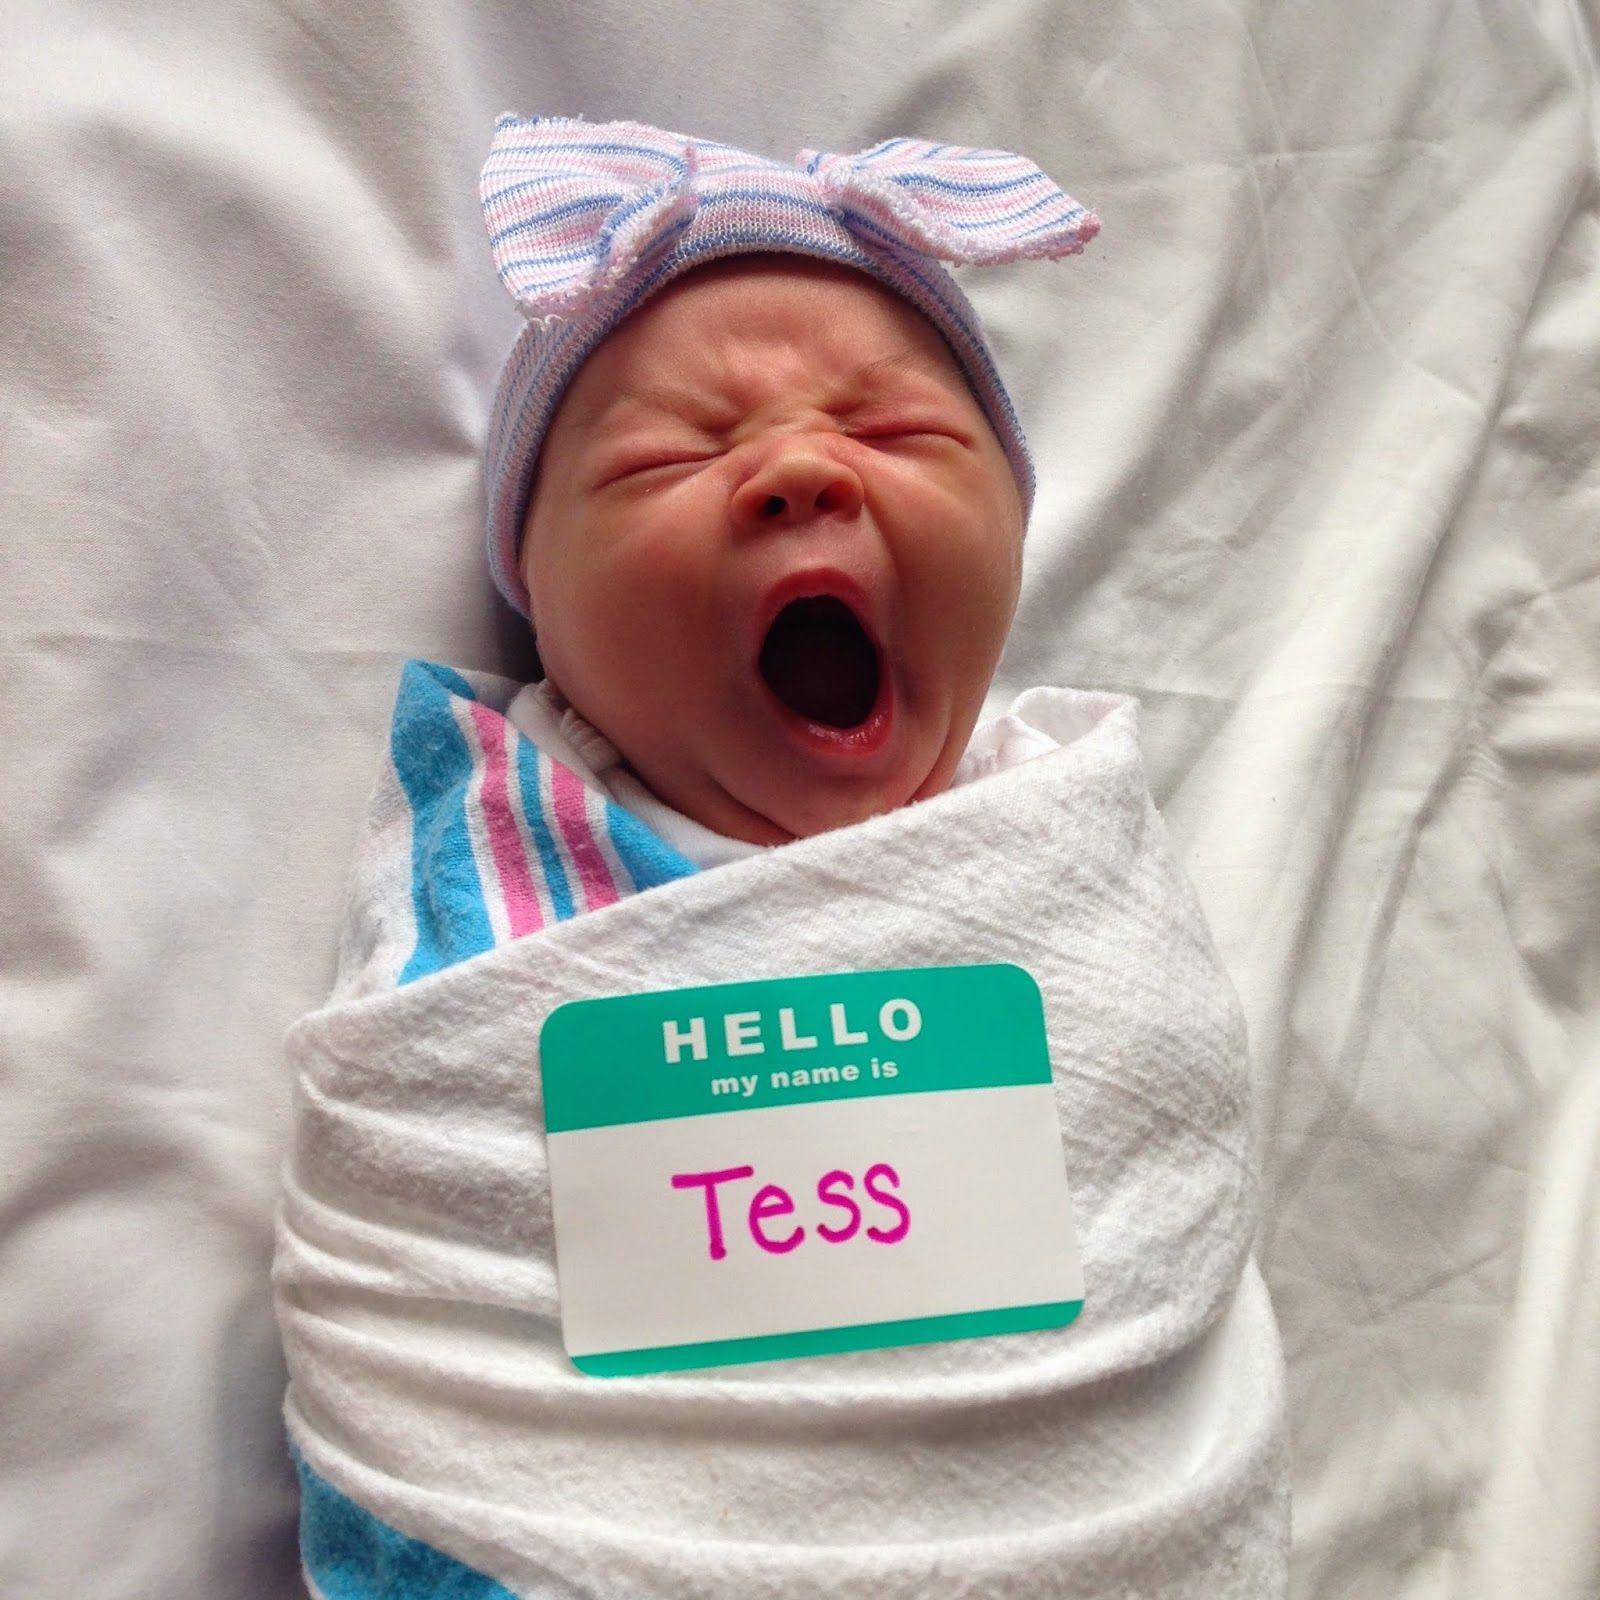 Cool newborn name tag 10 precious baby announcements tinyme blog